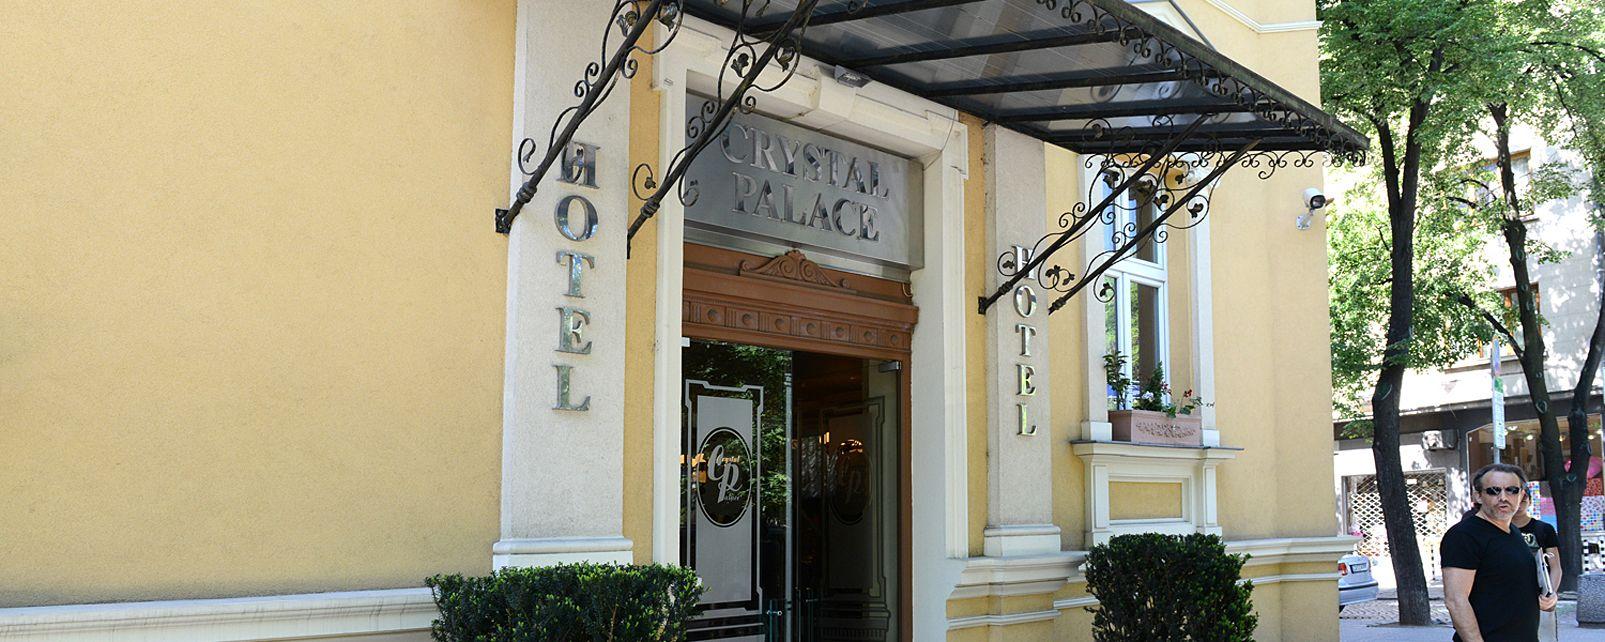 Hôtel Crystal Palace Boutique Hotel